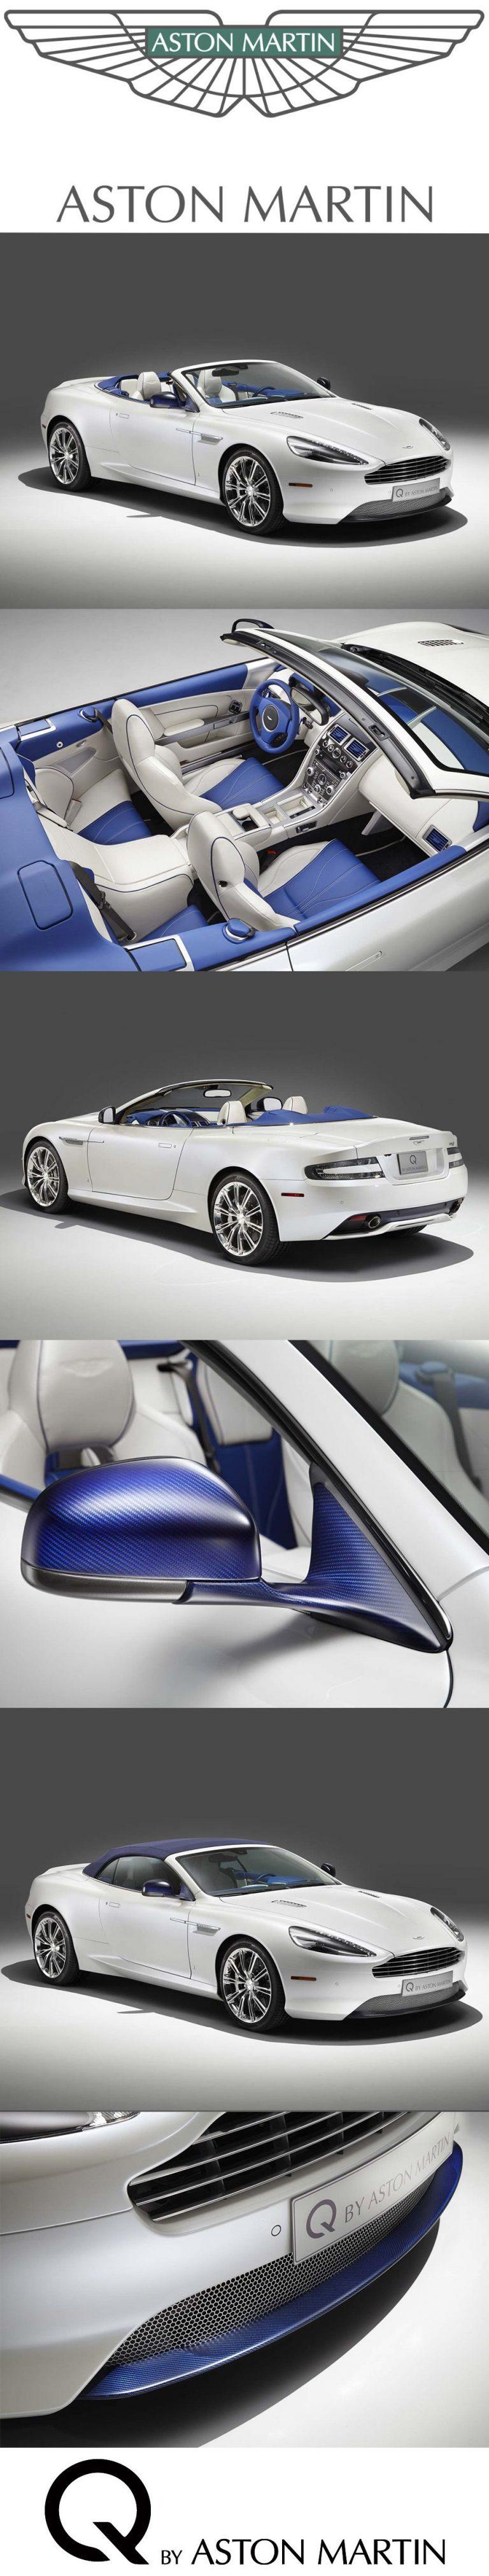 The 25 best luxury car dealers ideas on pinterest aston martin cars aston martin db9 volante and aston martin convertible